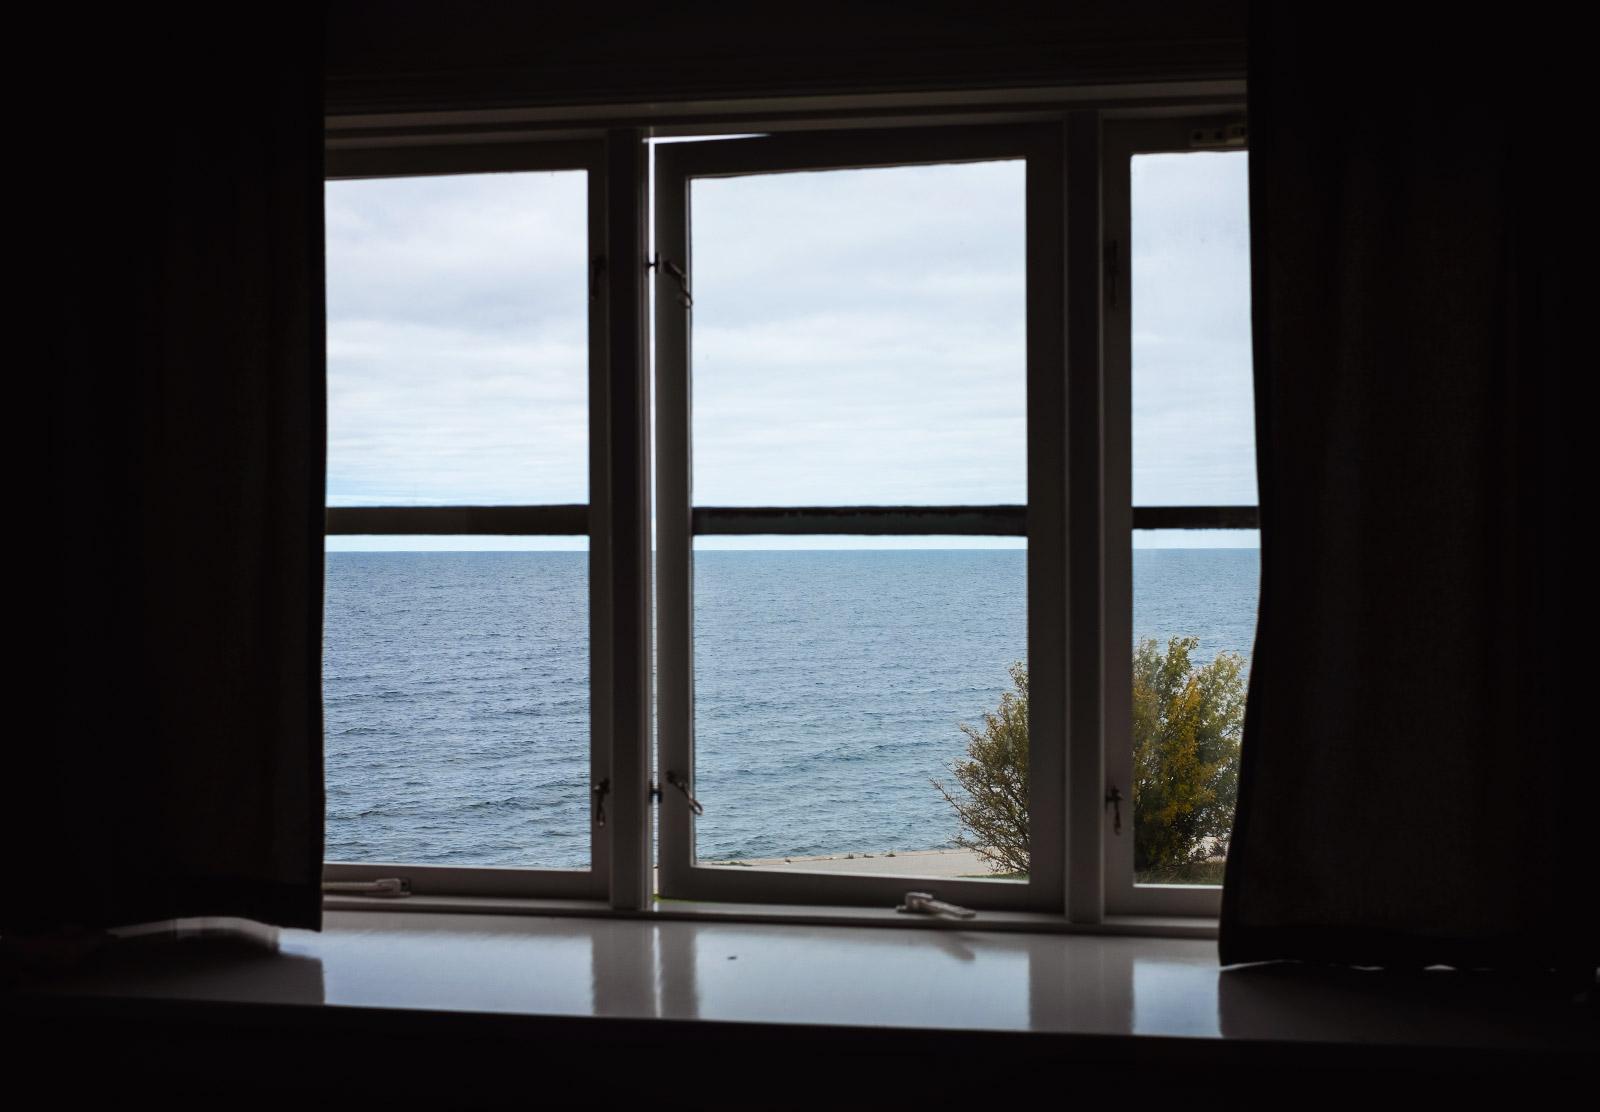 Ocean through window